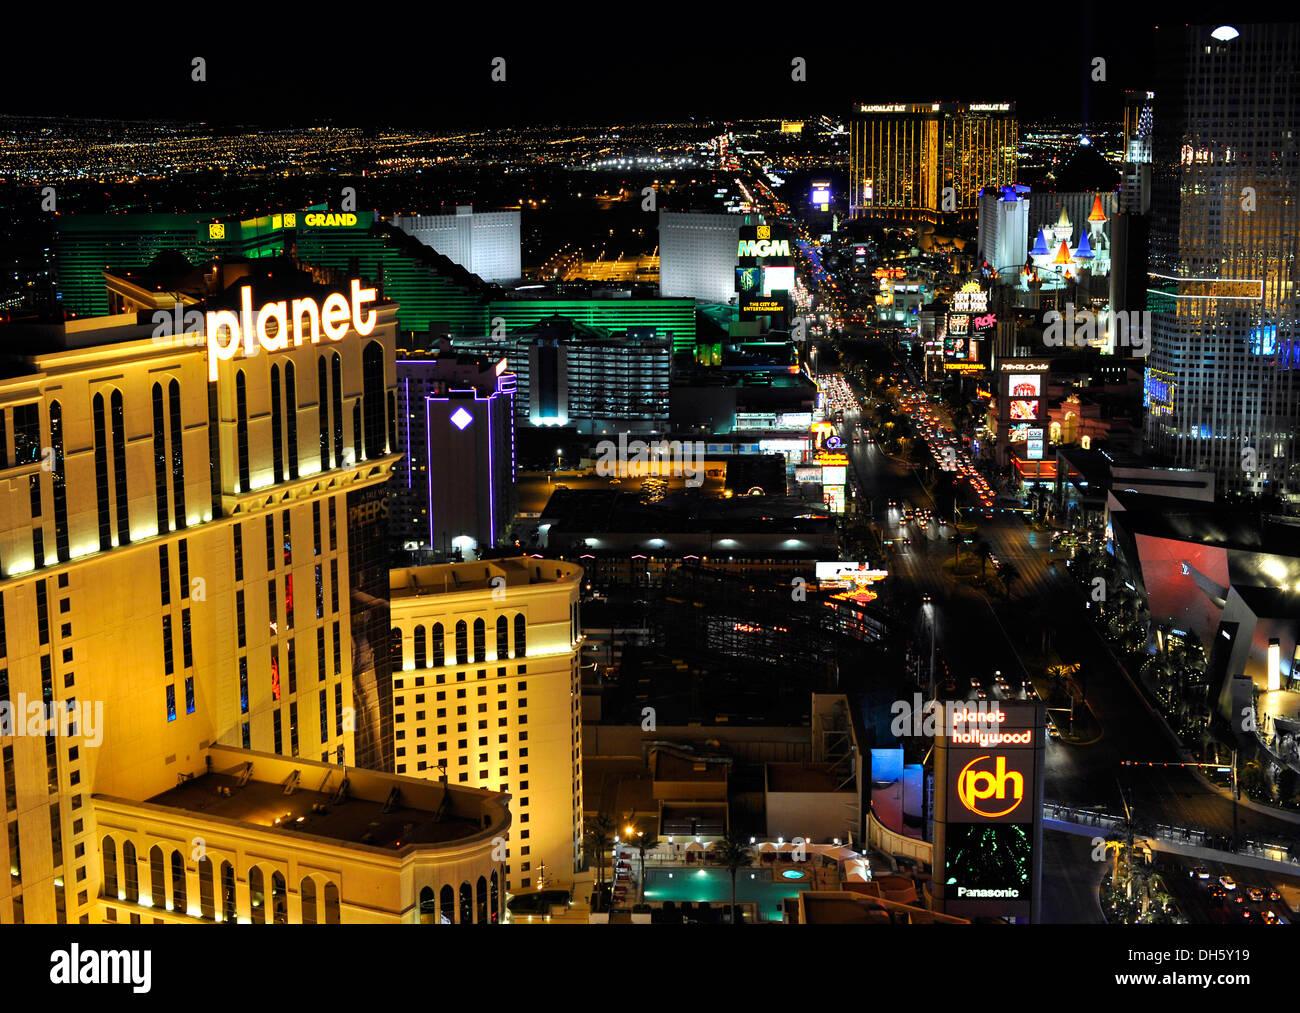 Night scene, The Strip, Planet Hollywood luxury hotel, MGM Grand, New York, Mandalay Bay, Excalibur, Vegas, Nevada - Stock Image